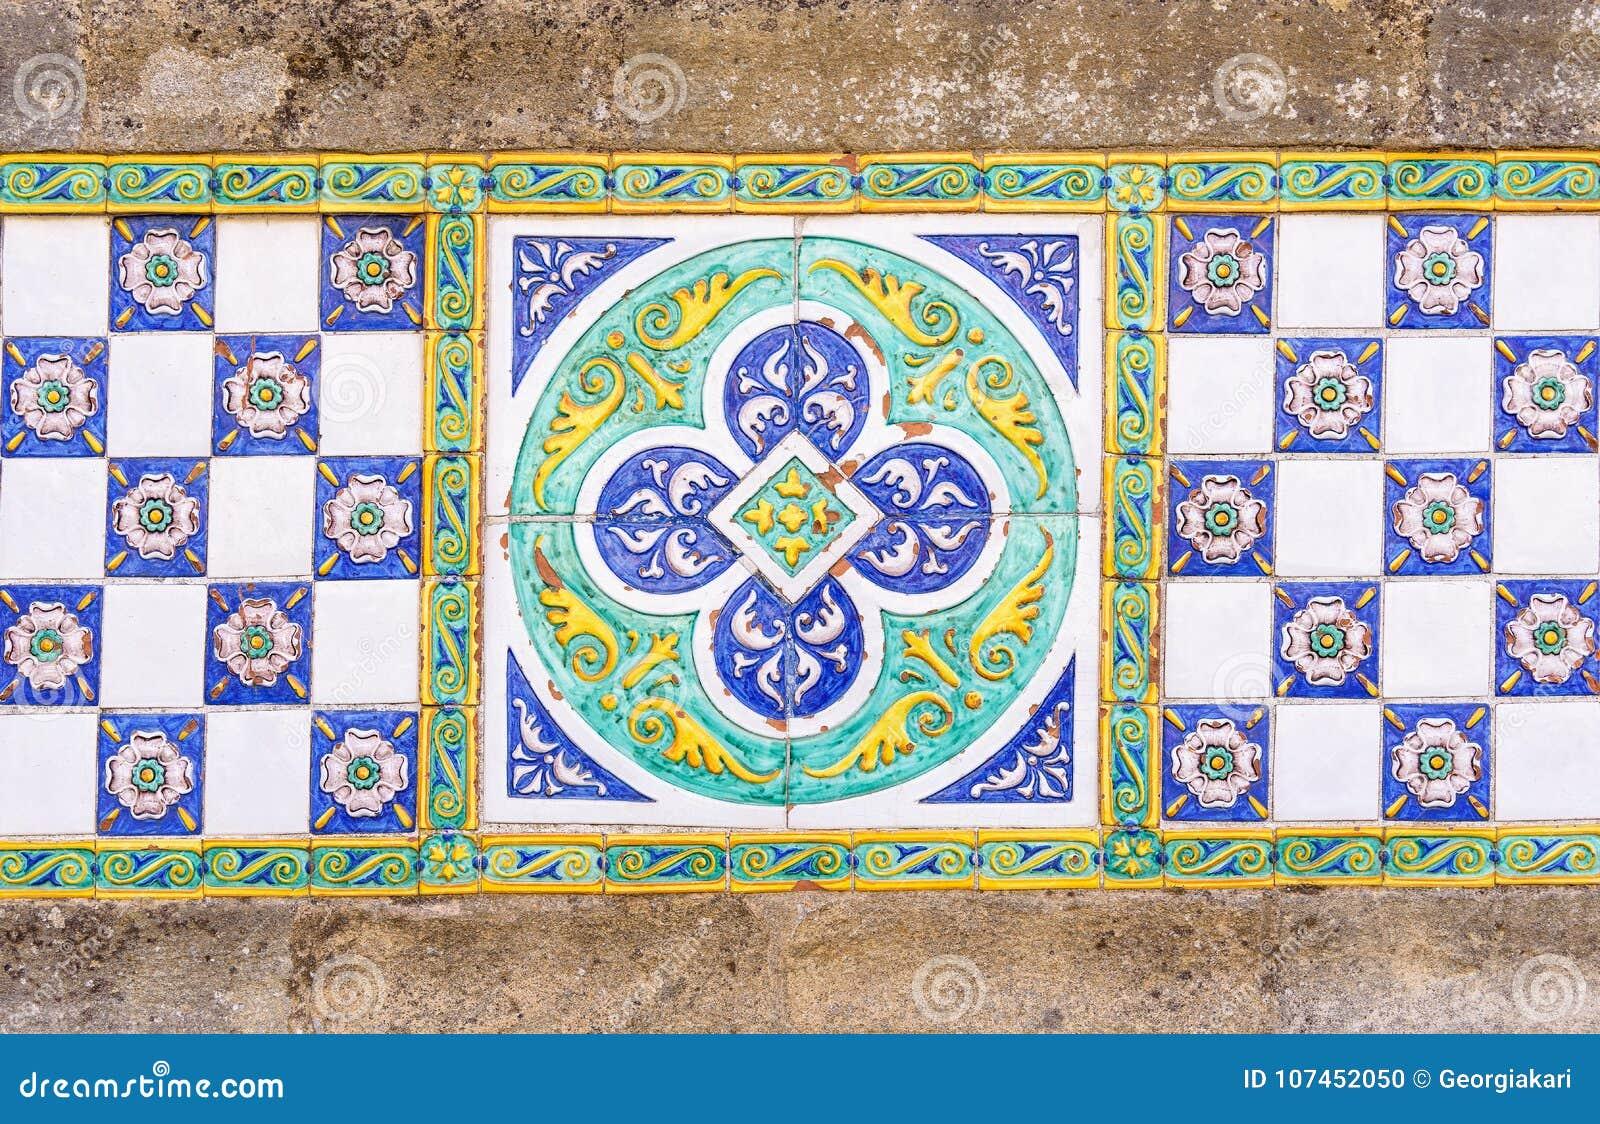 Colored ceramic tiles in caltagirone sicily italy stock photo colored ceramic tiles in caltagirone sicily italy dailygadgetfo Images